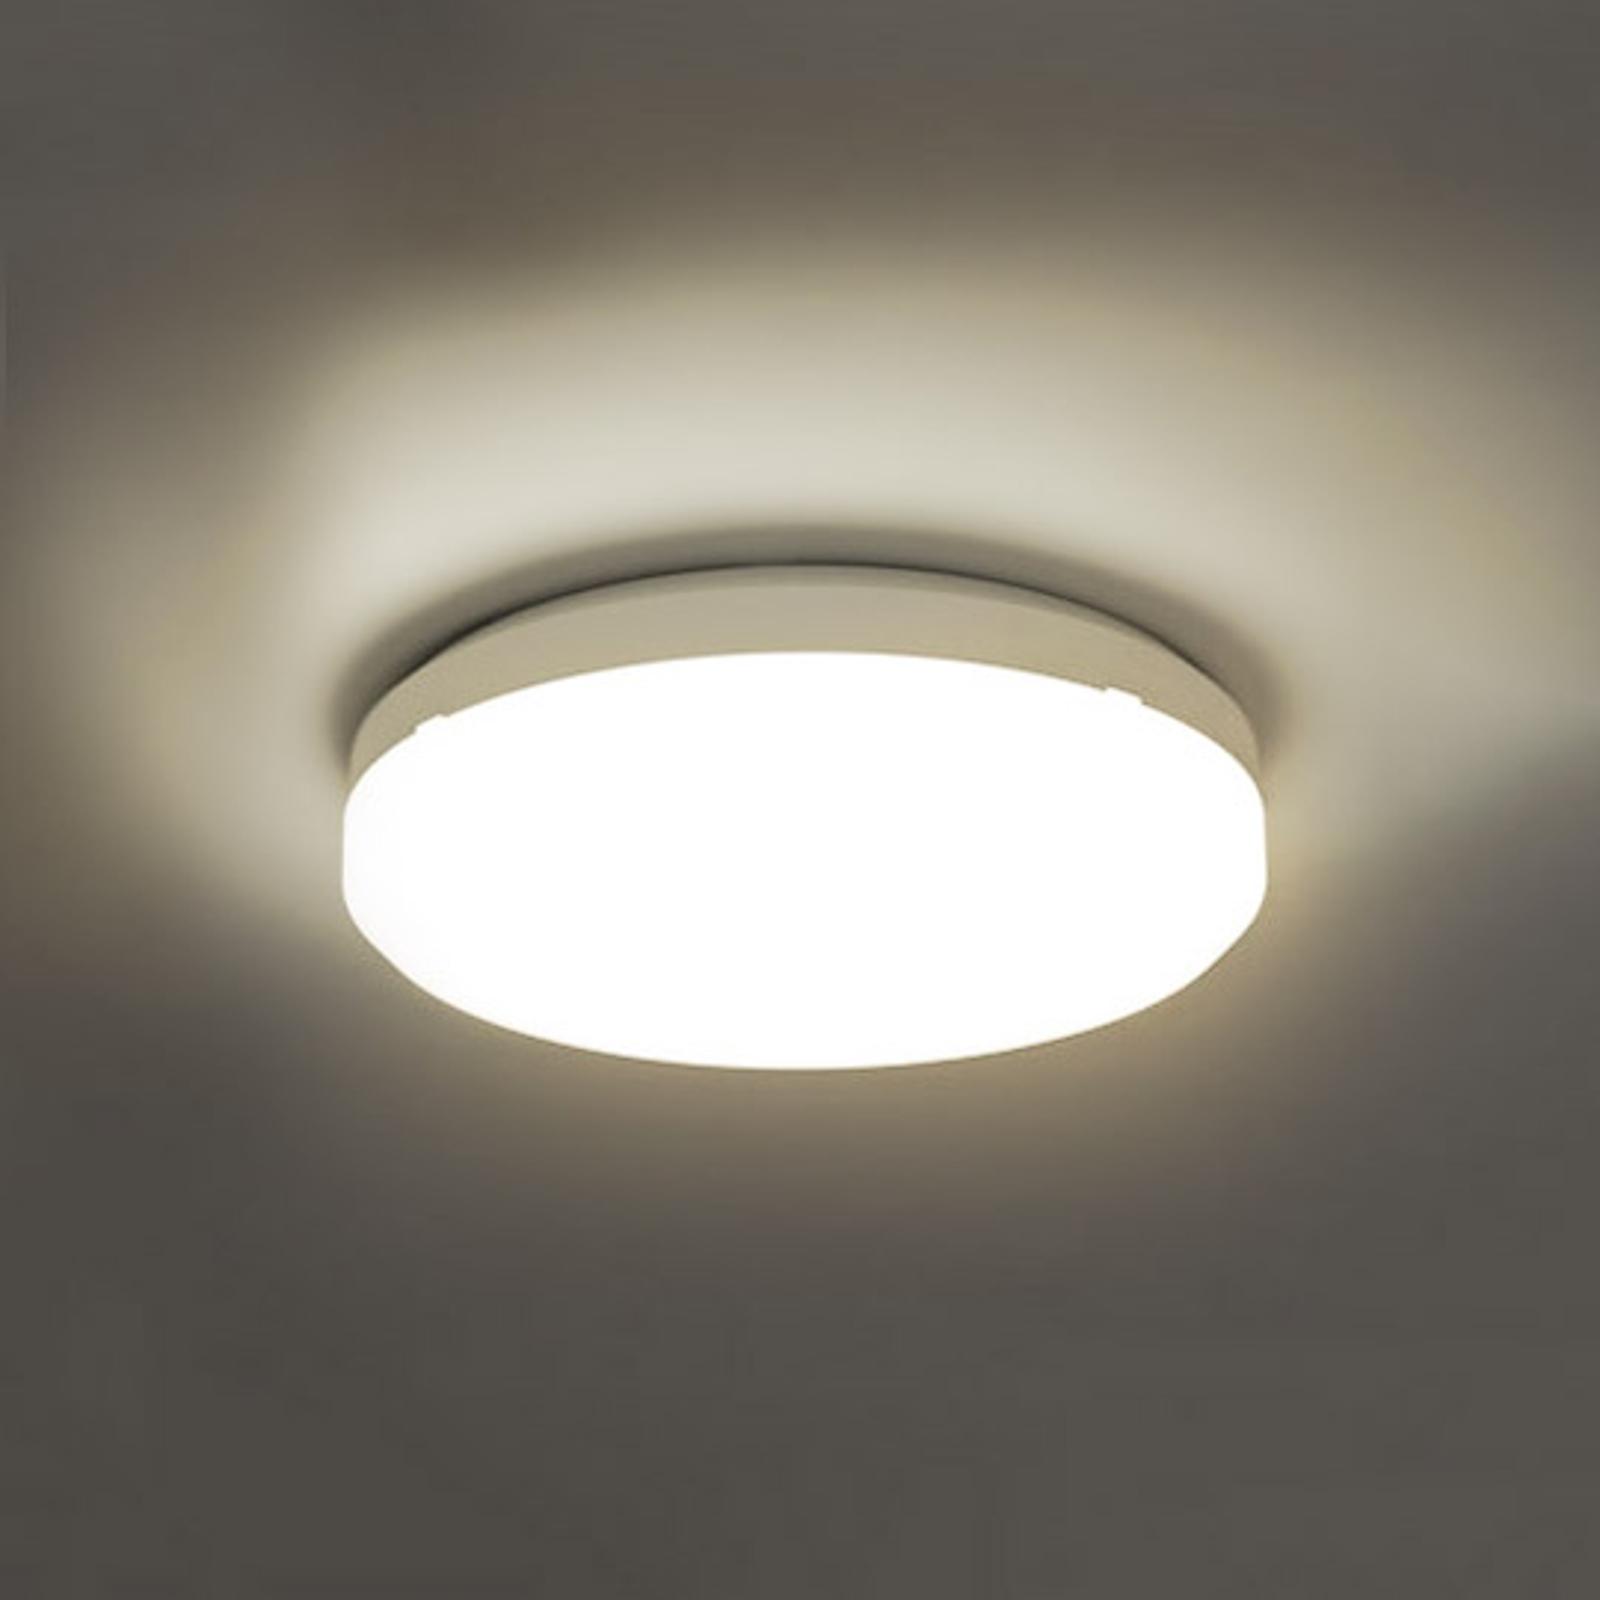 Plafonnier LED Sun 15 IP65 18 W 3 000K